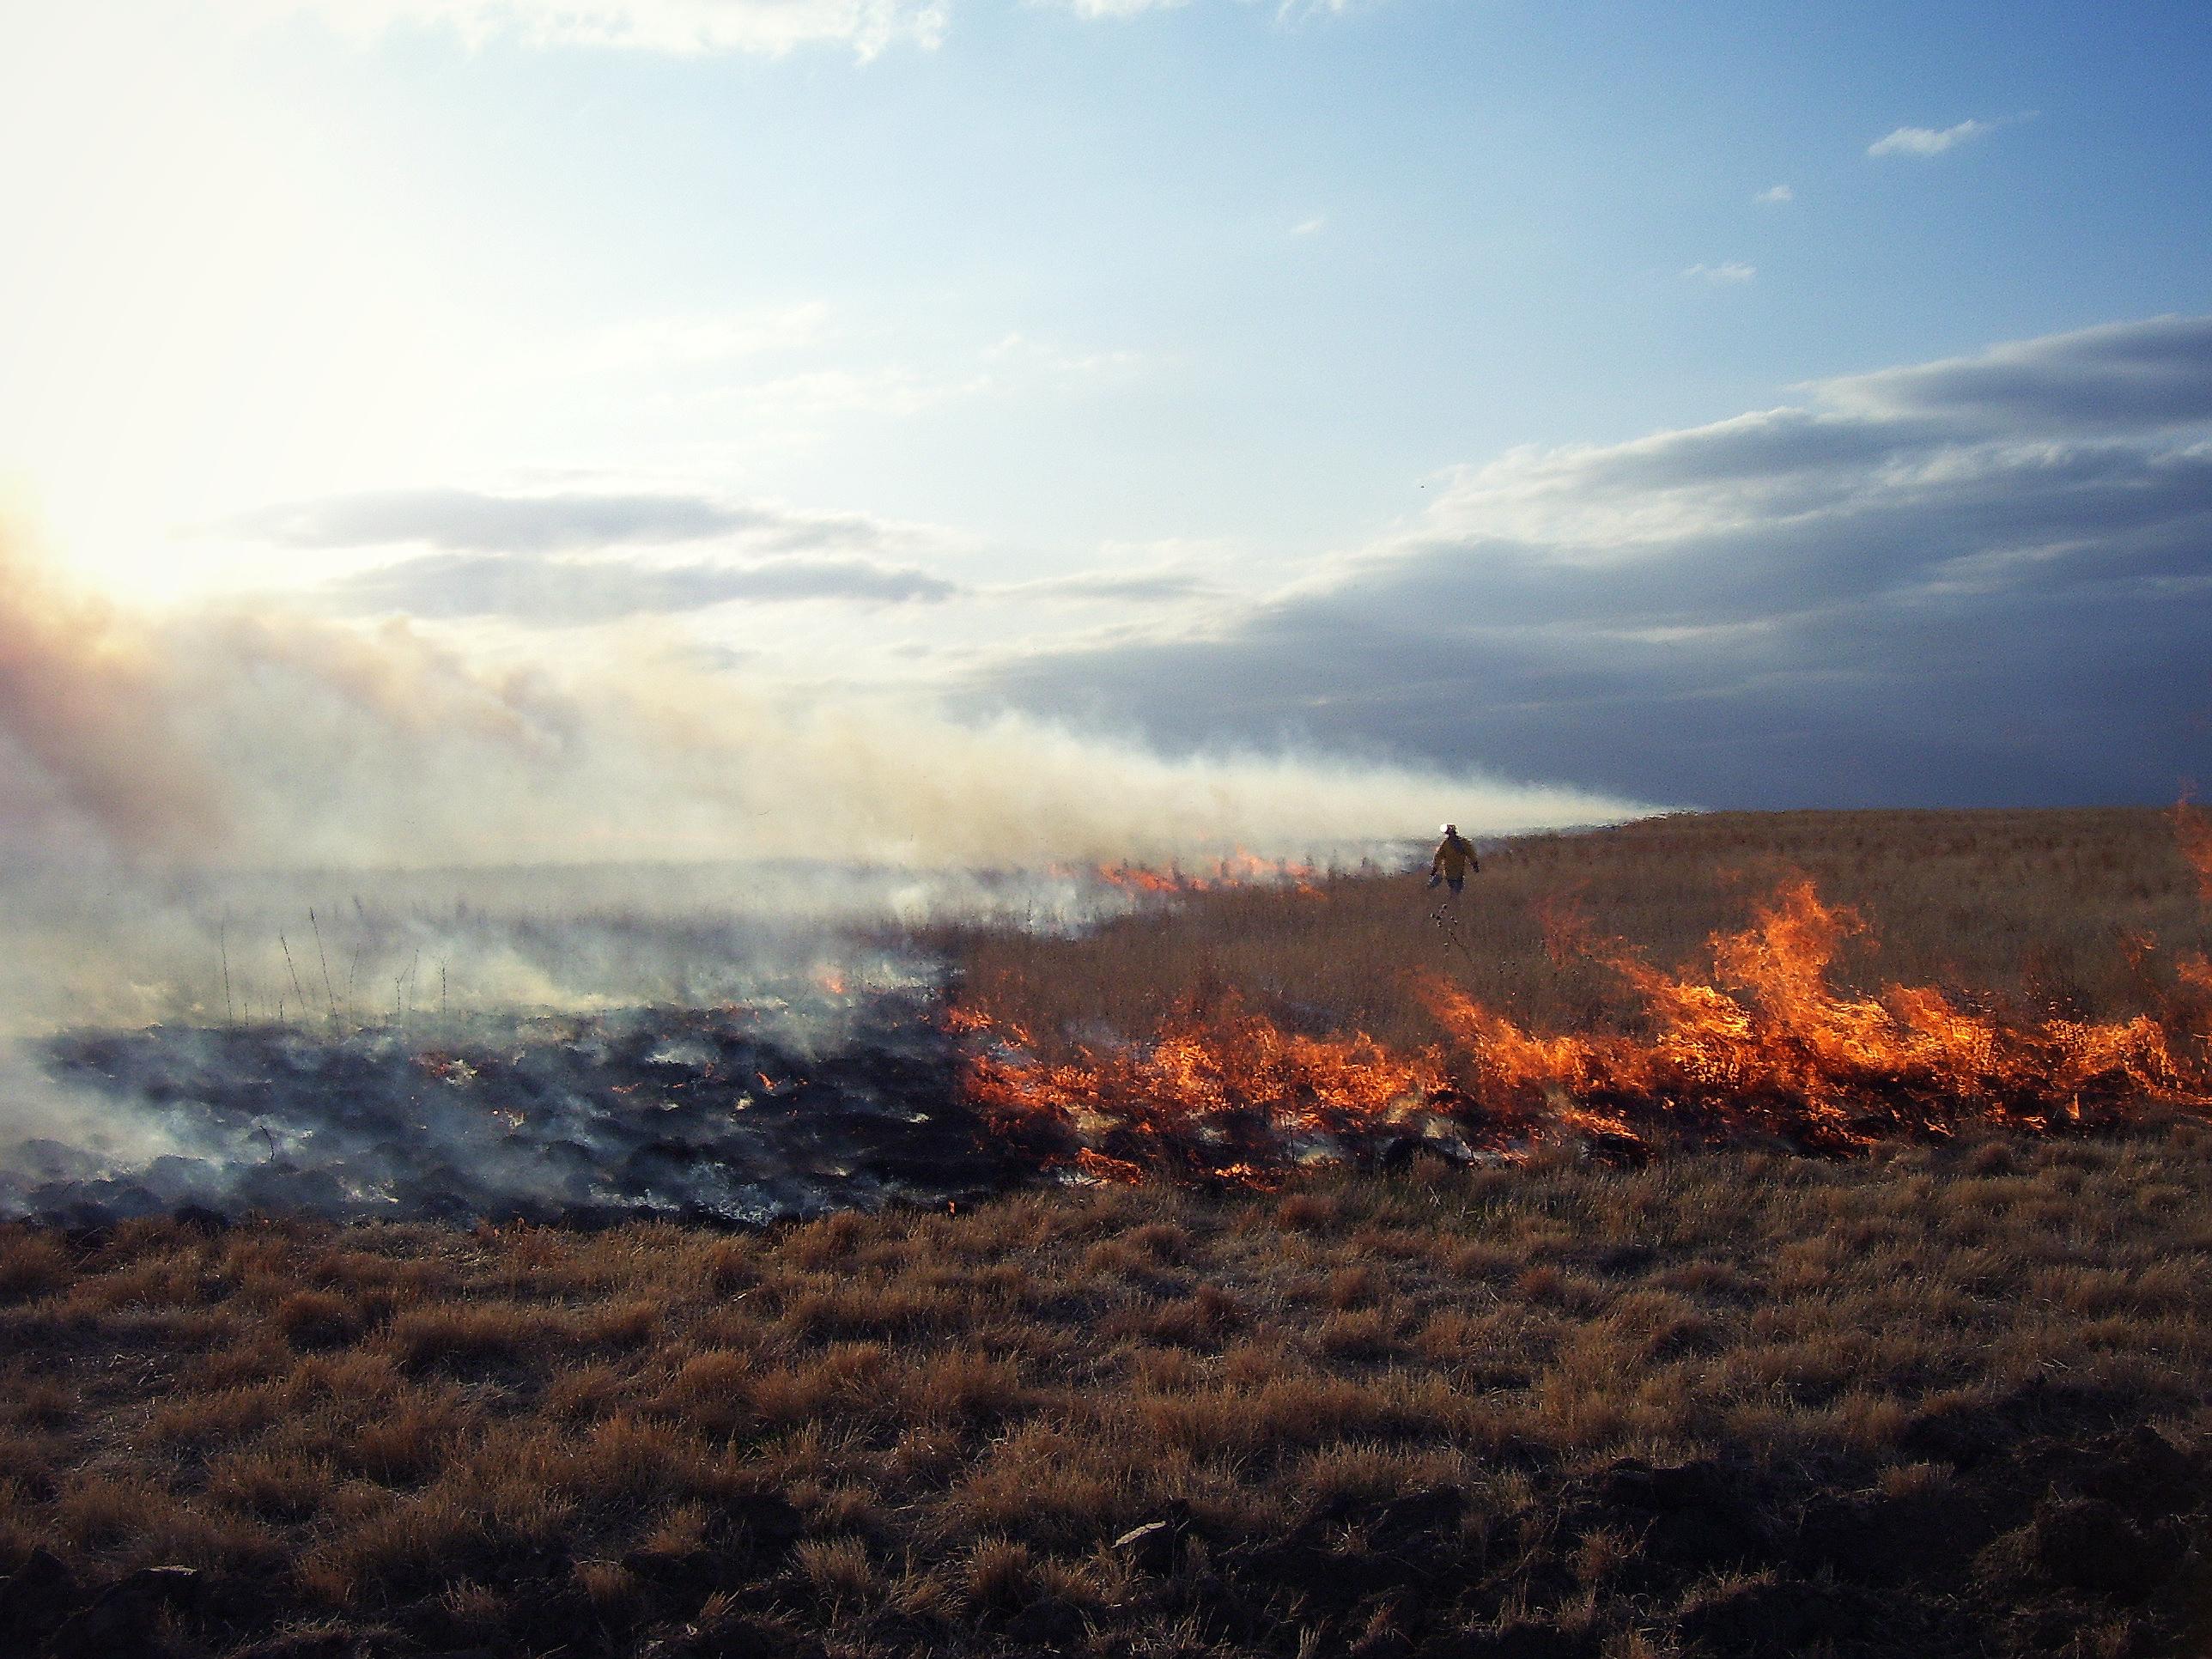 Fire pictures 044adj.jpg